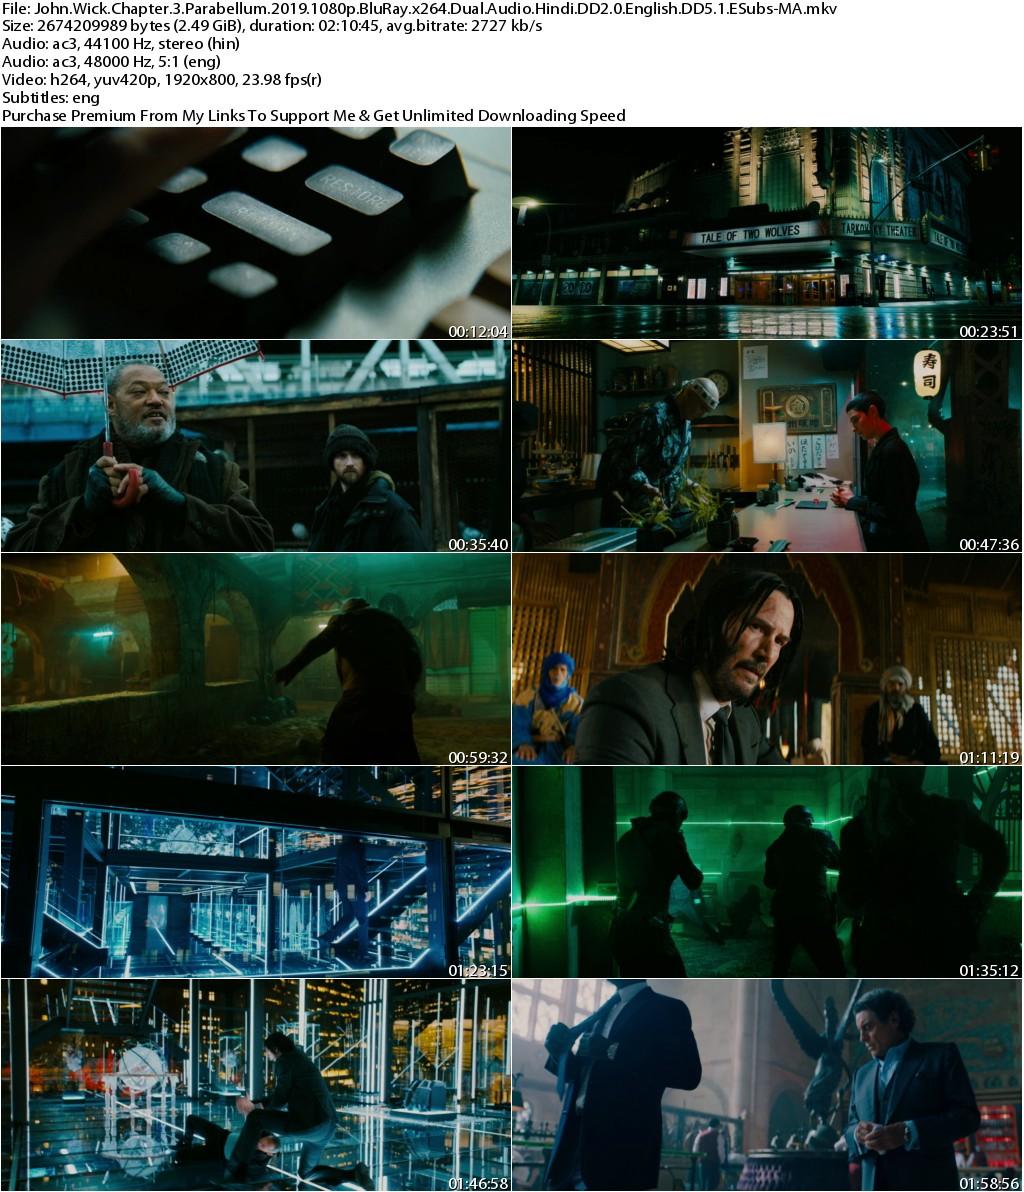 John Wick Chapter 3 Parabellum (2019) 1080p BluRay x264 Dual Audio Hindi DD2.0 English DD5.1 ESubs-MA